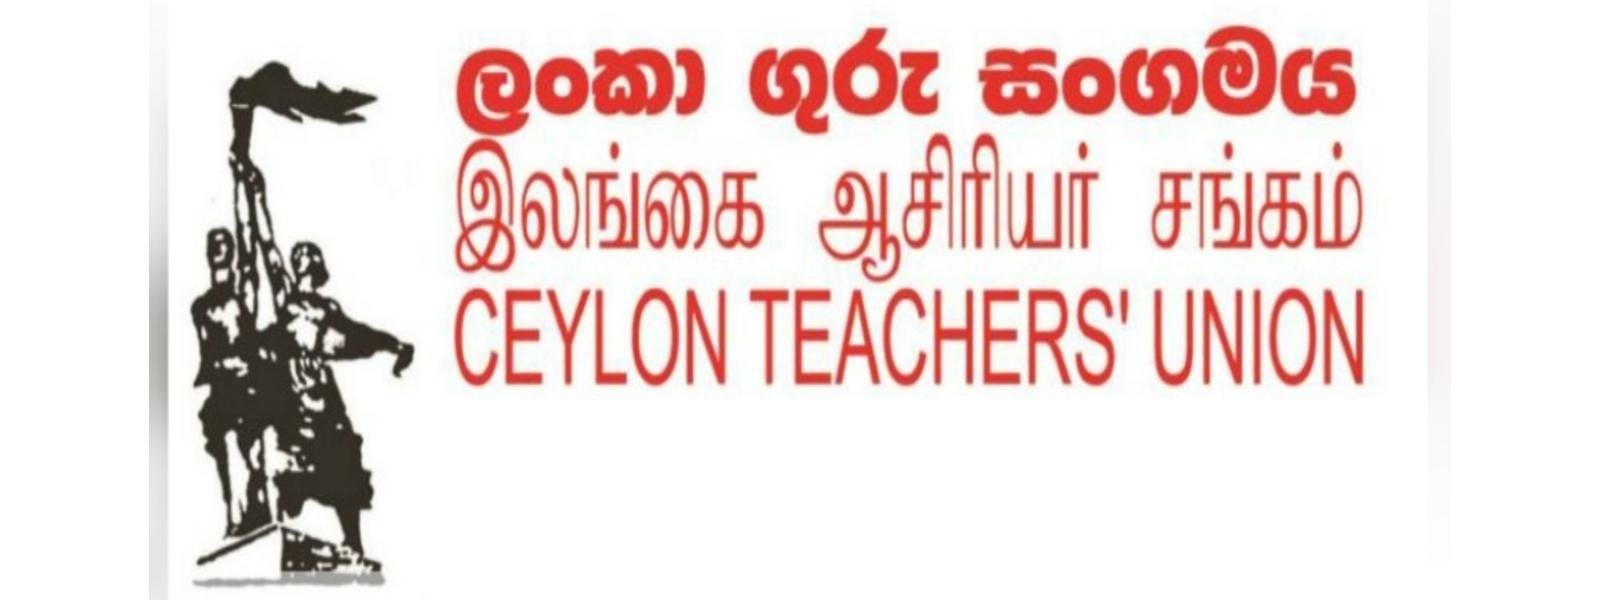 GCE A/L STUDENTS NEGLECTED: CEYLON TEACHERS UNION